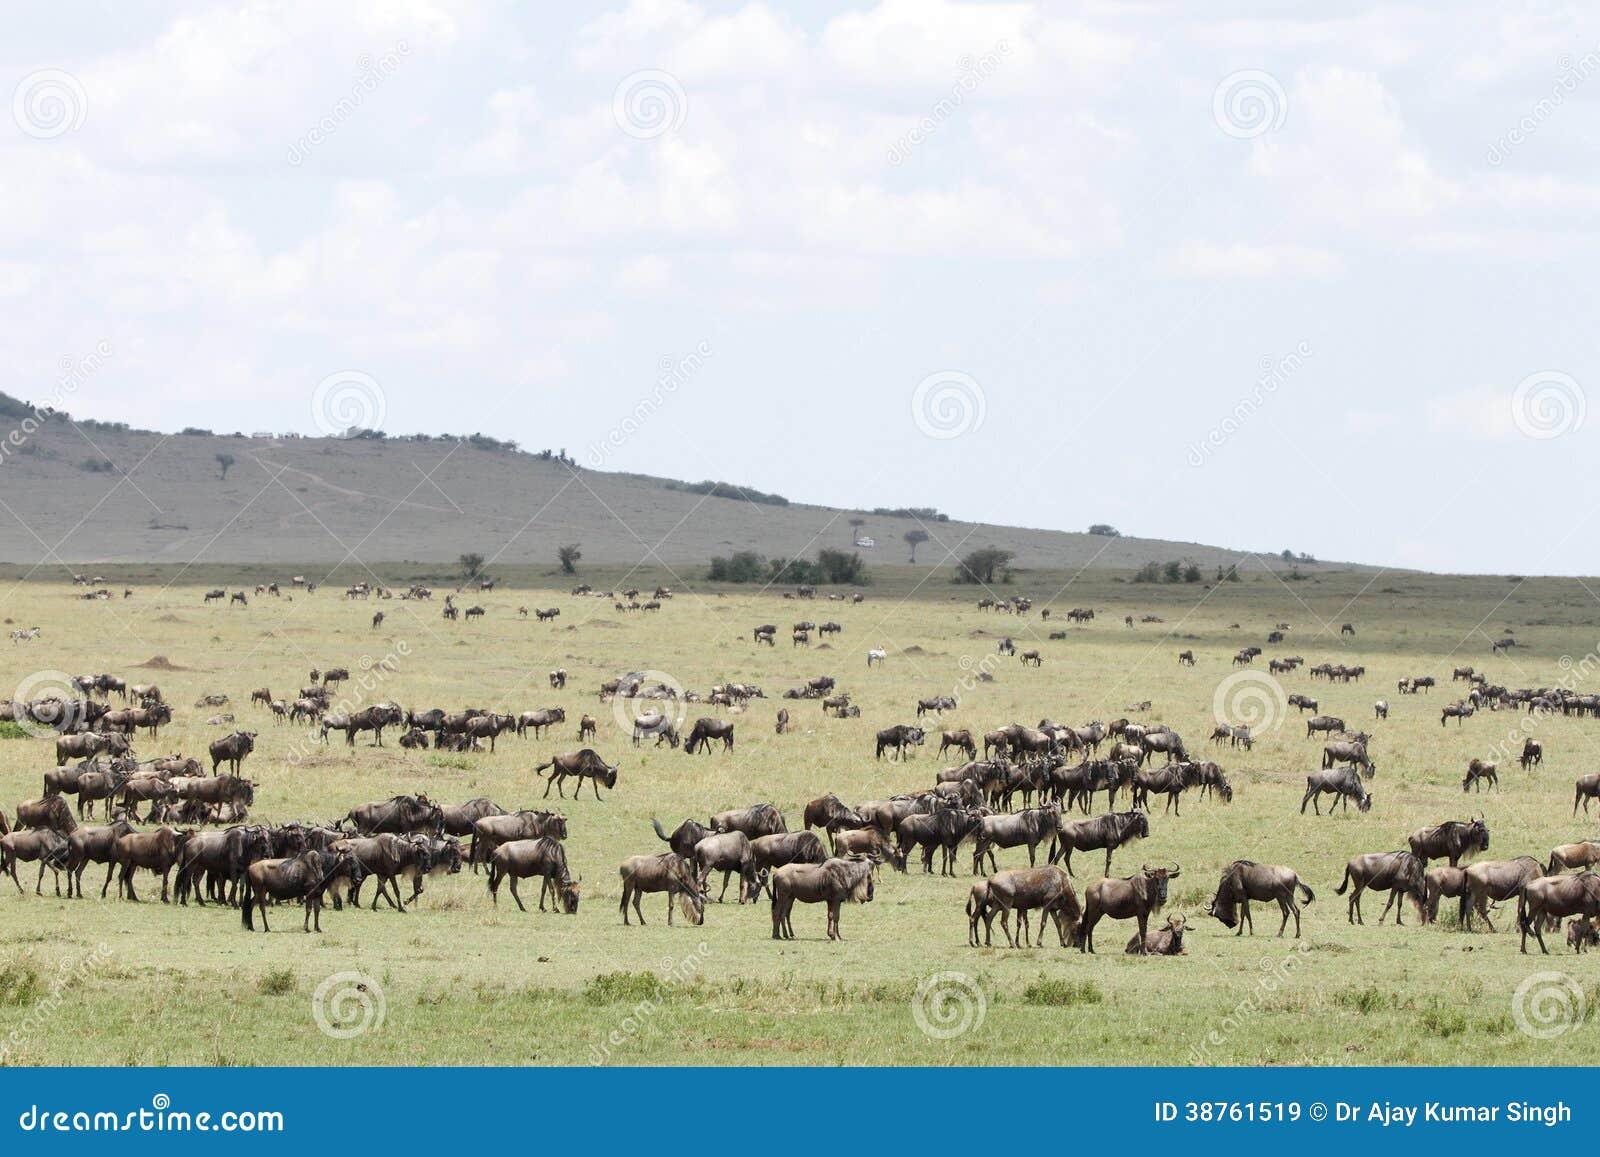 the wide spread grassland Ungulate Grasslands